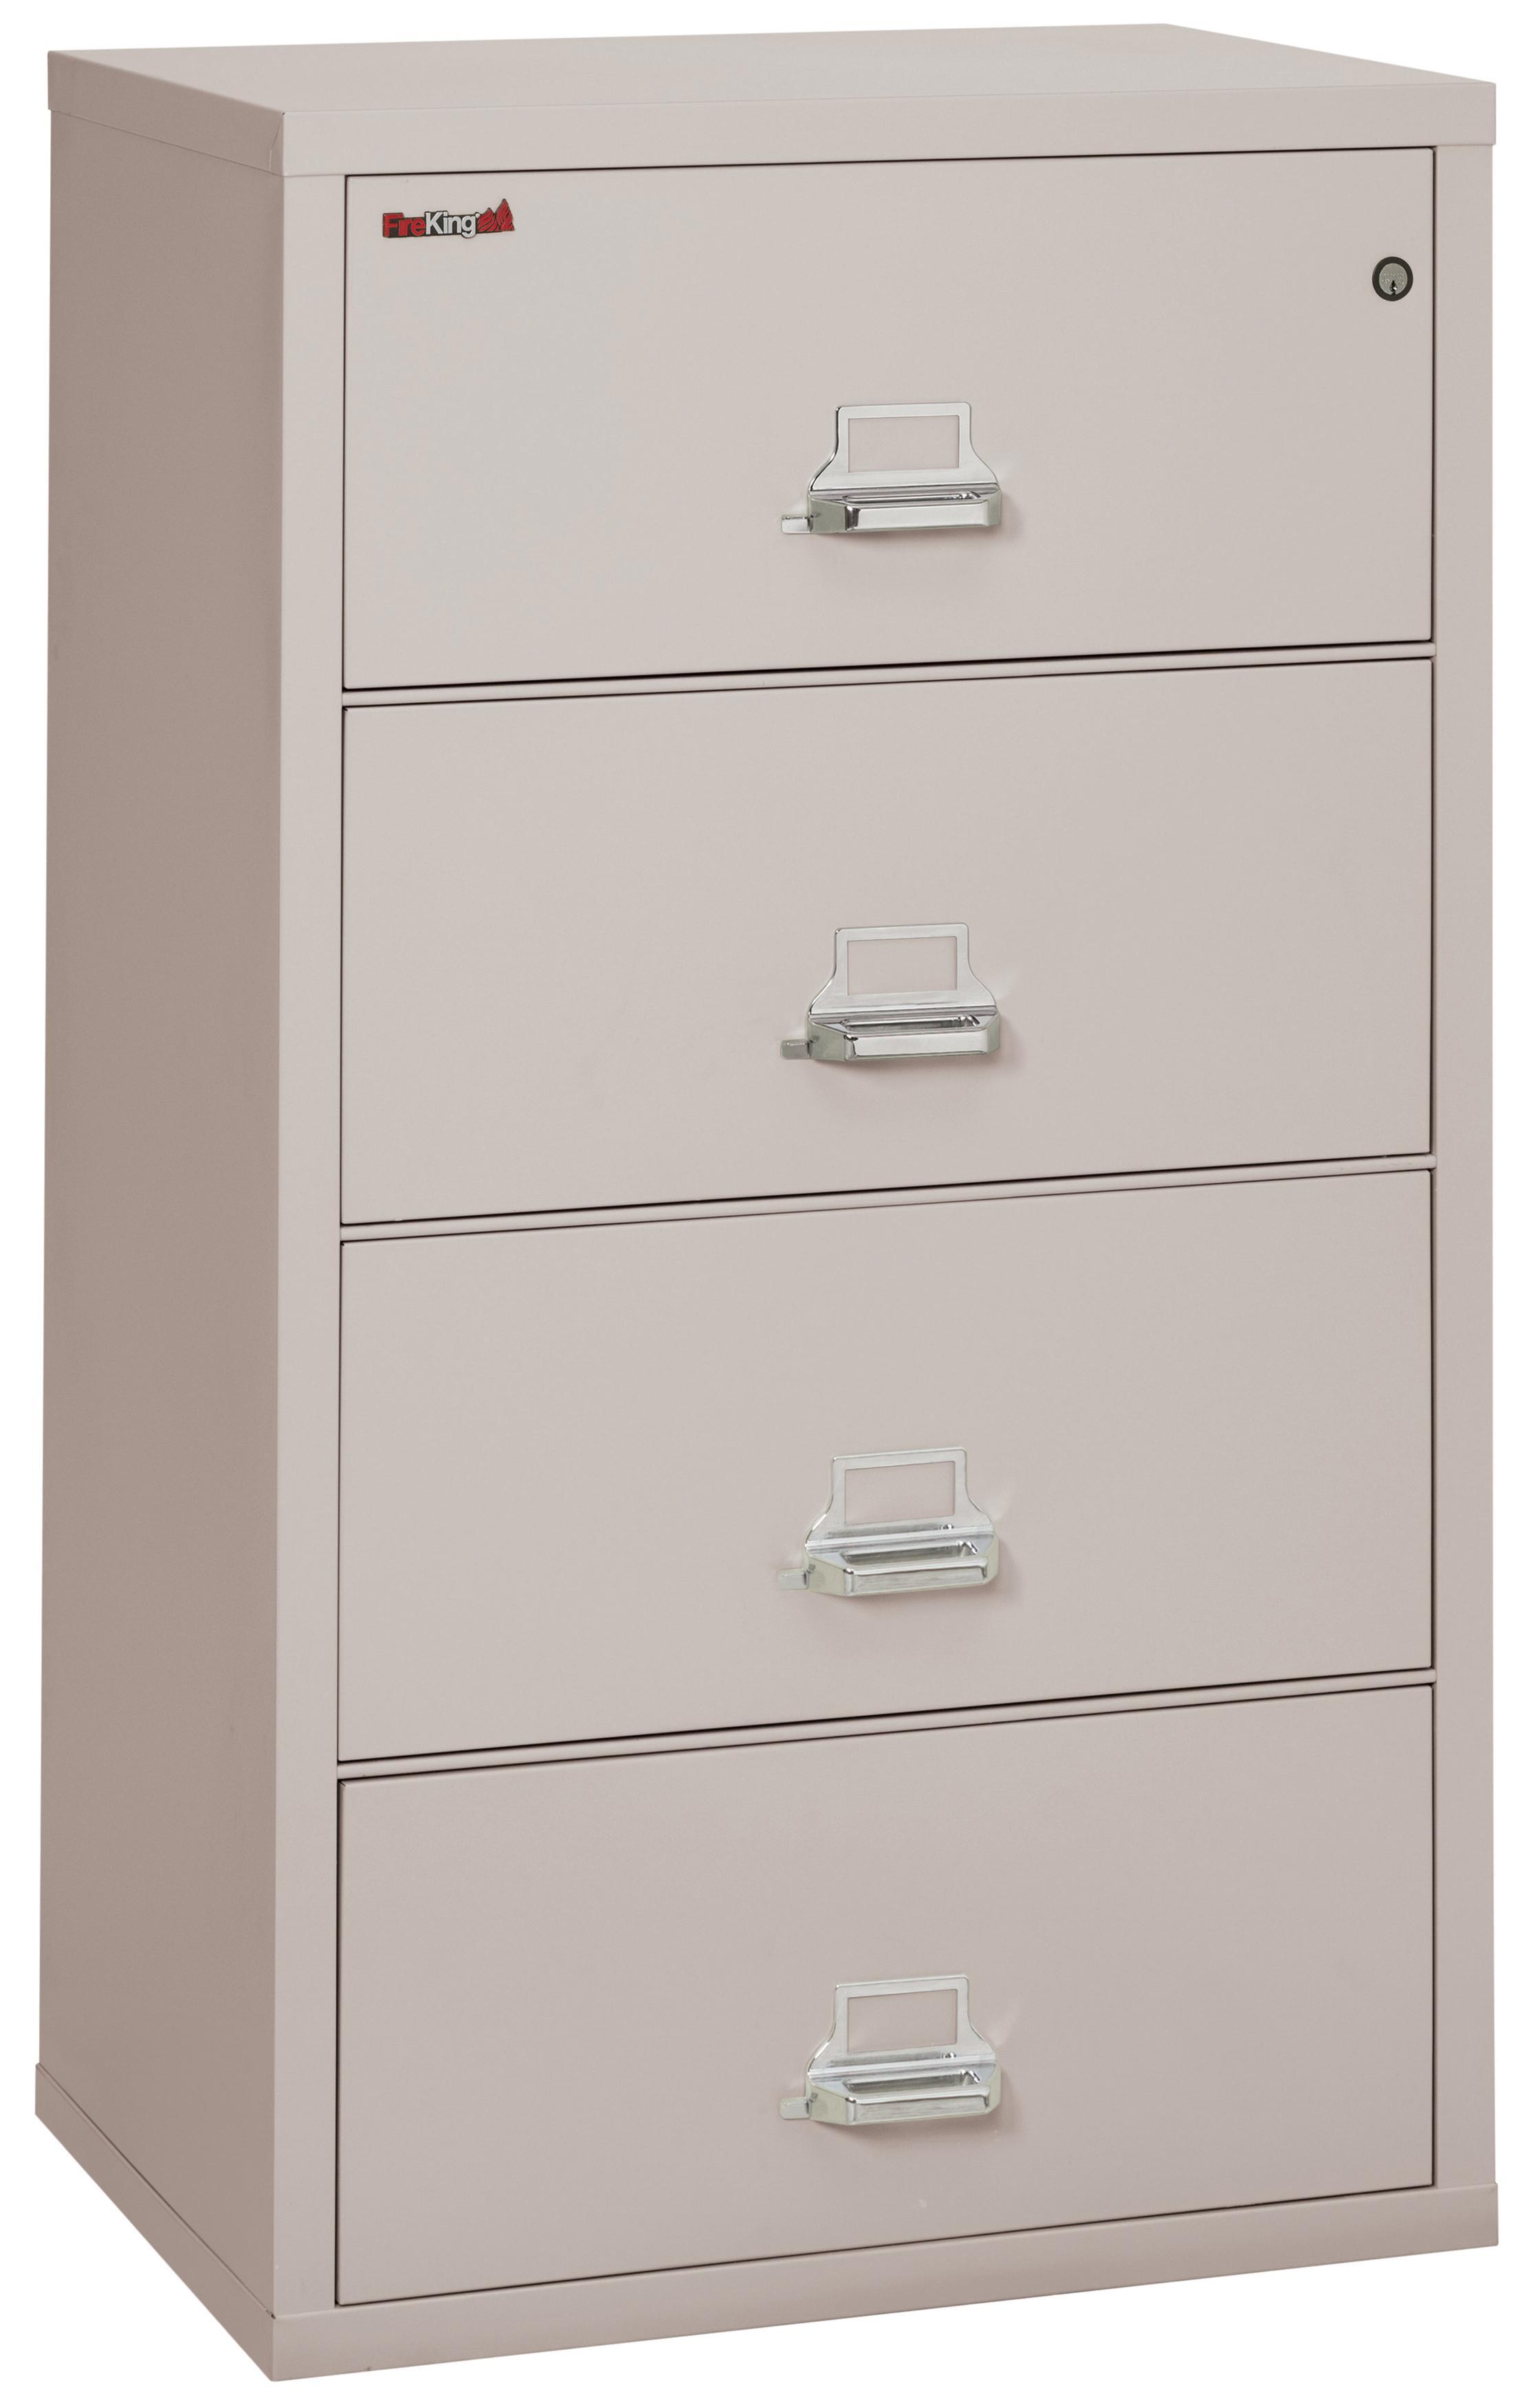 Amazon Com Fireking Fireproof Lateral File Cabinet 4